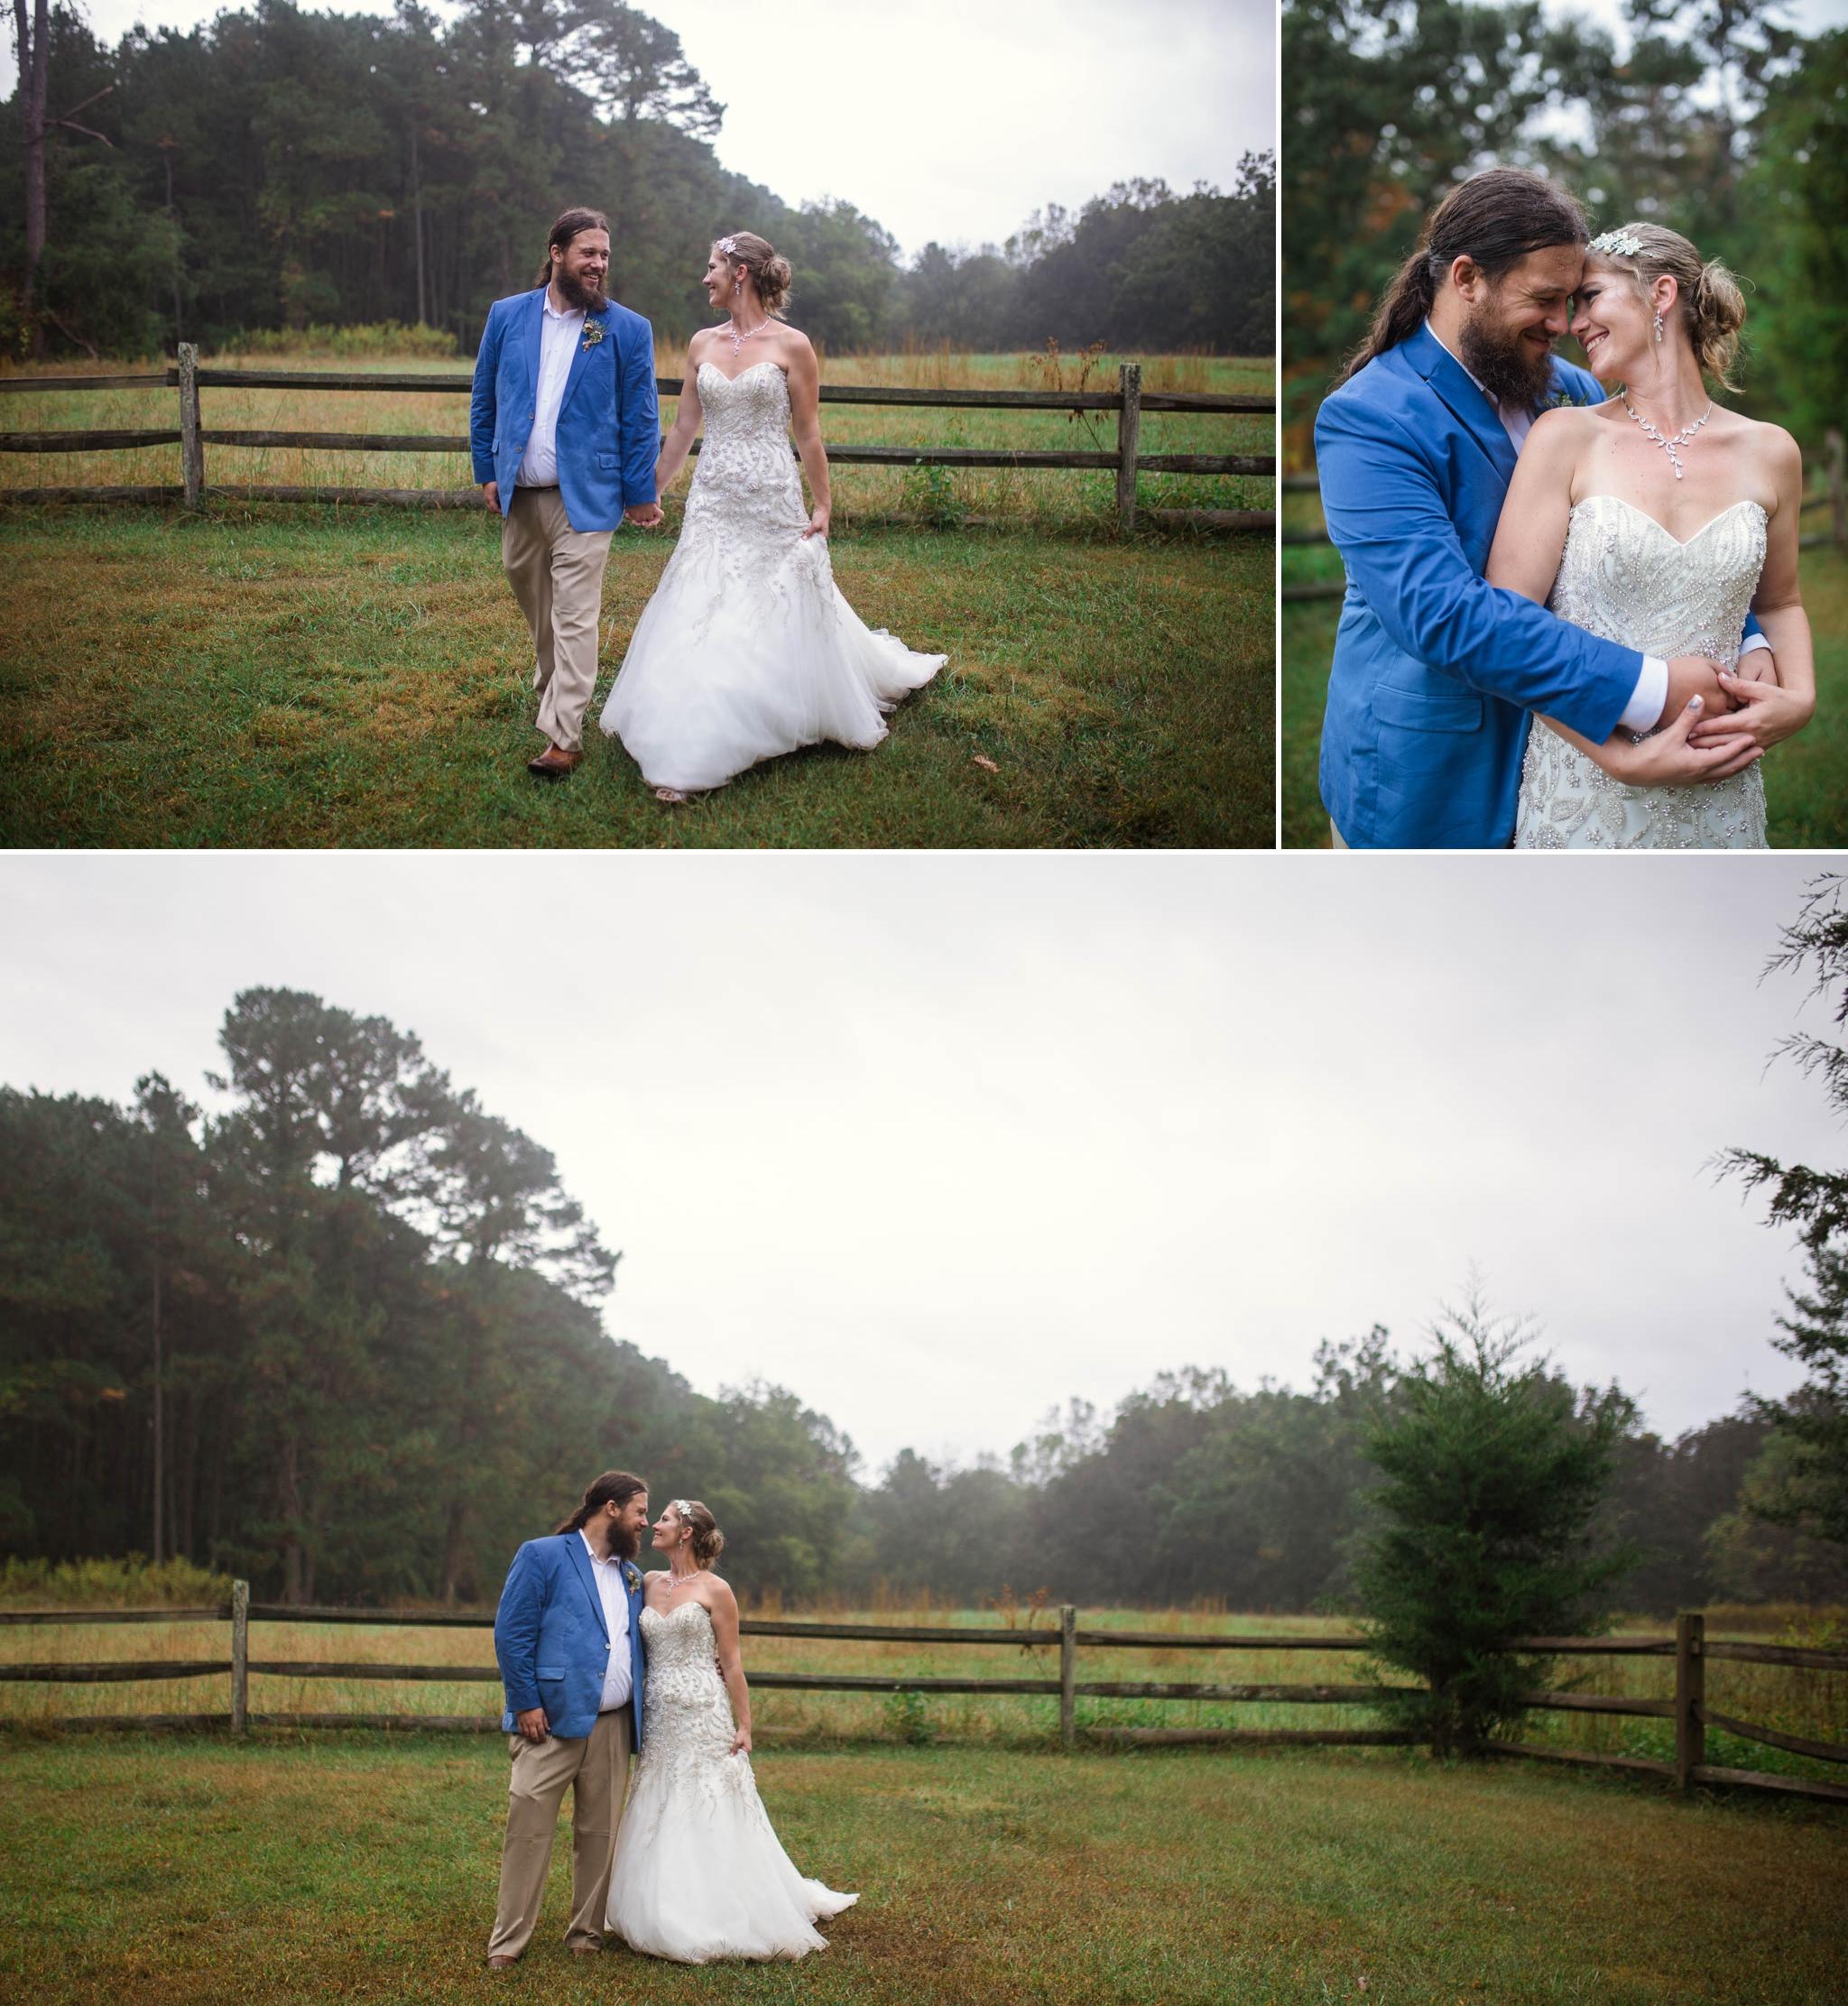 Wedding Photography at the Timberlake Earth Sanctuary in Whitsett, NC - Raleigh North Carolina Wedding Photographer 17.jpg